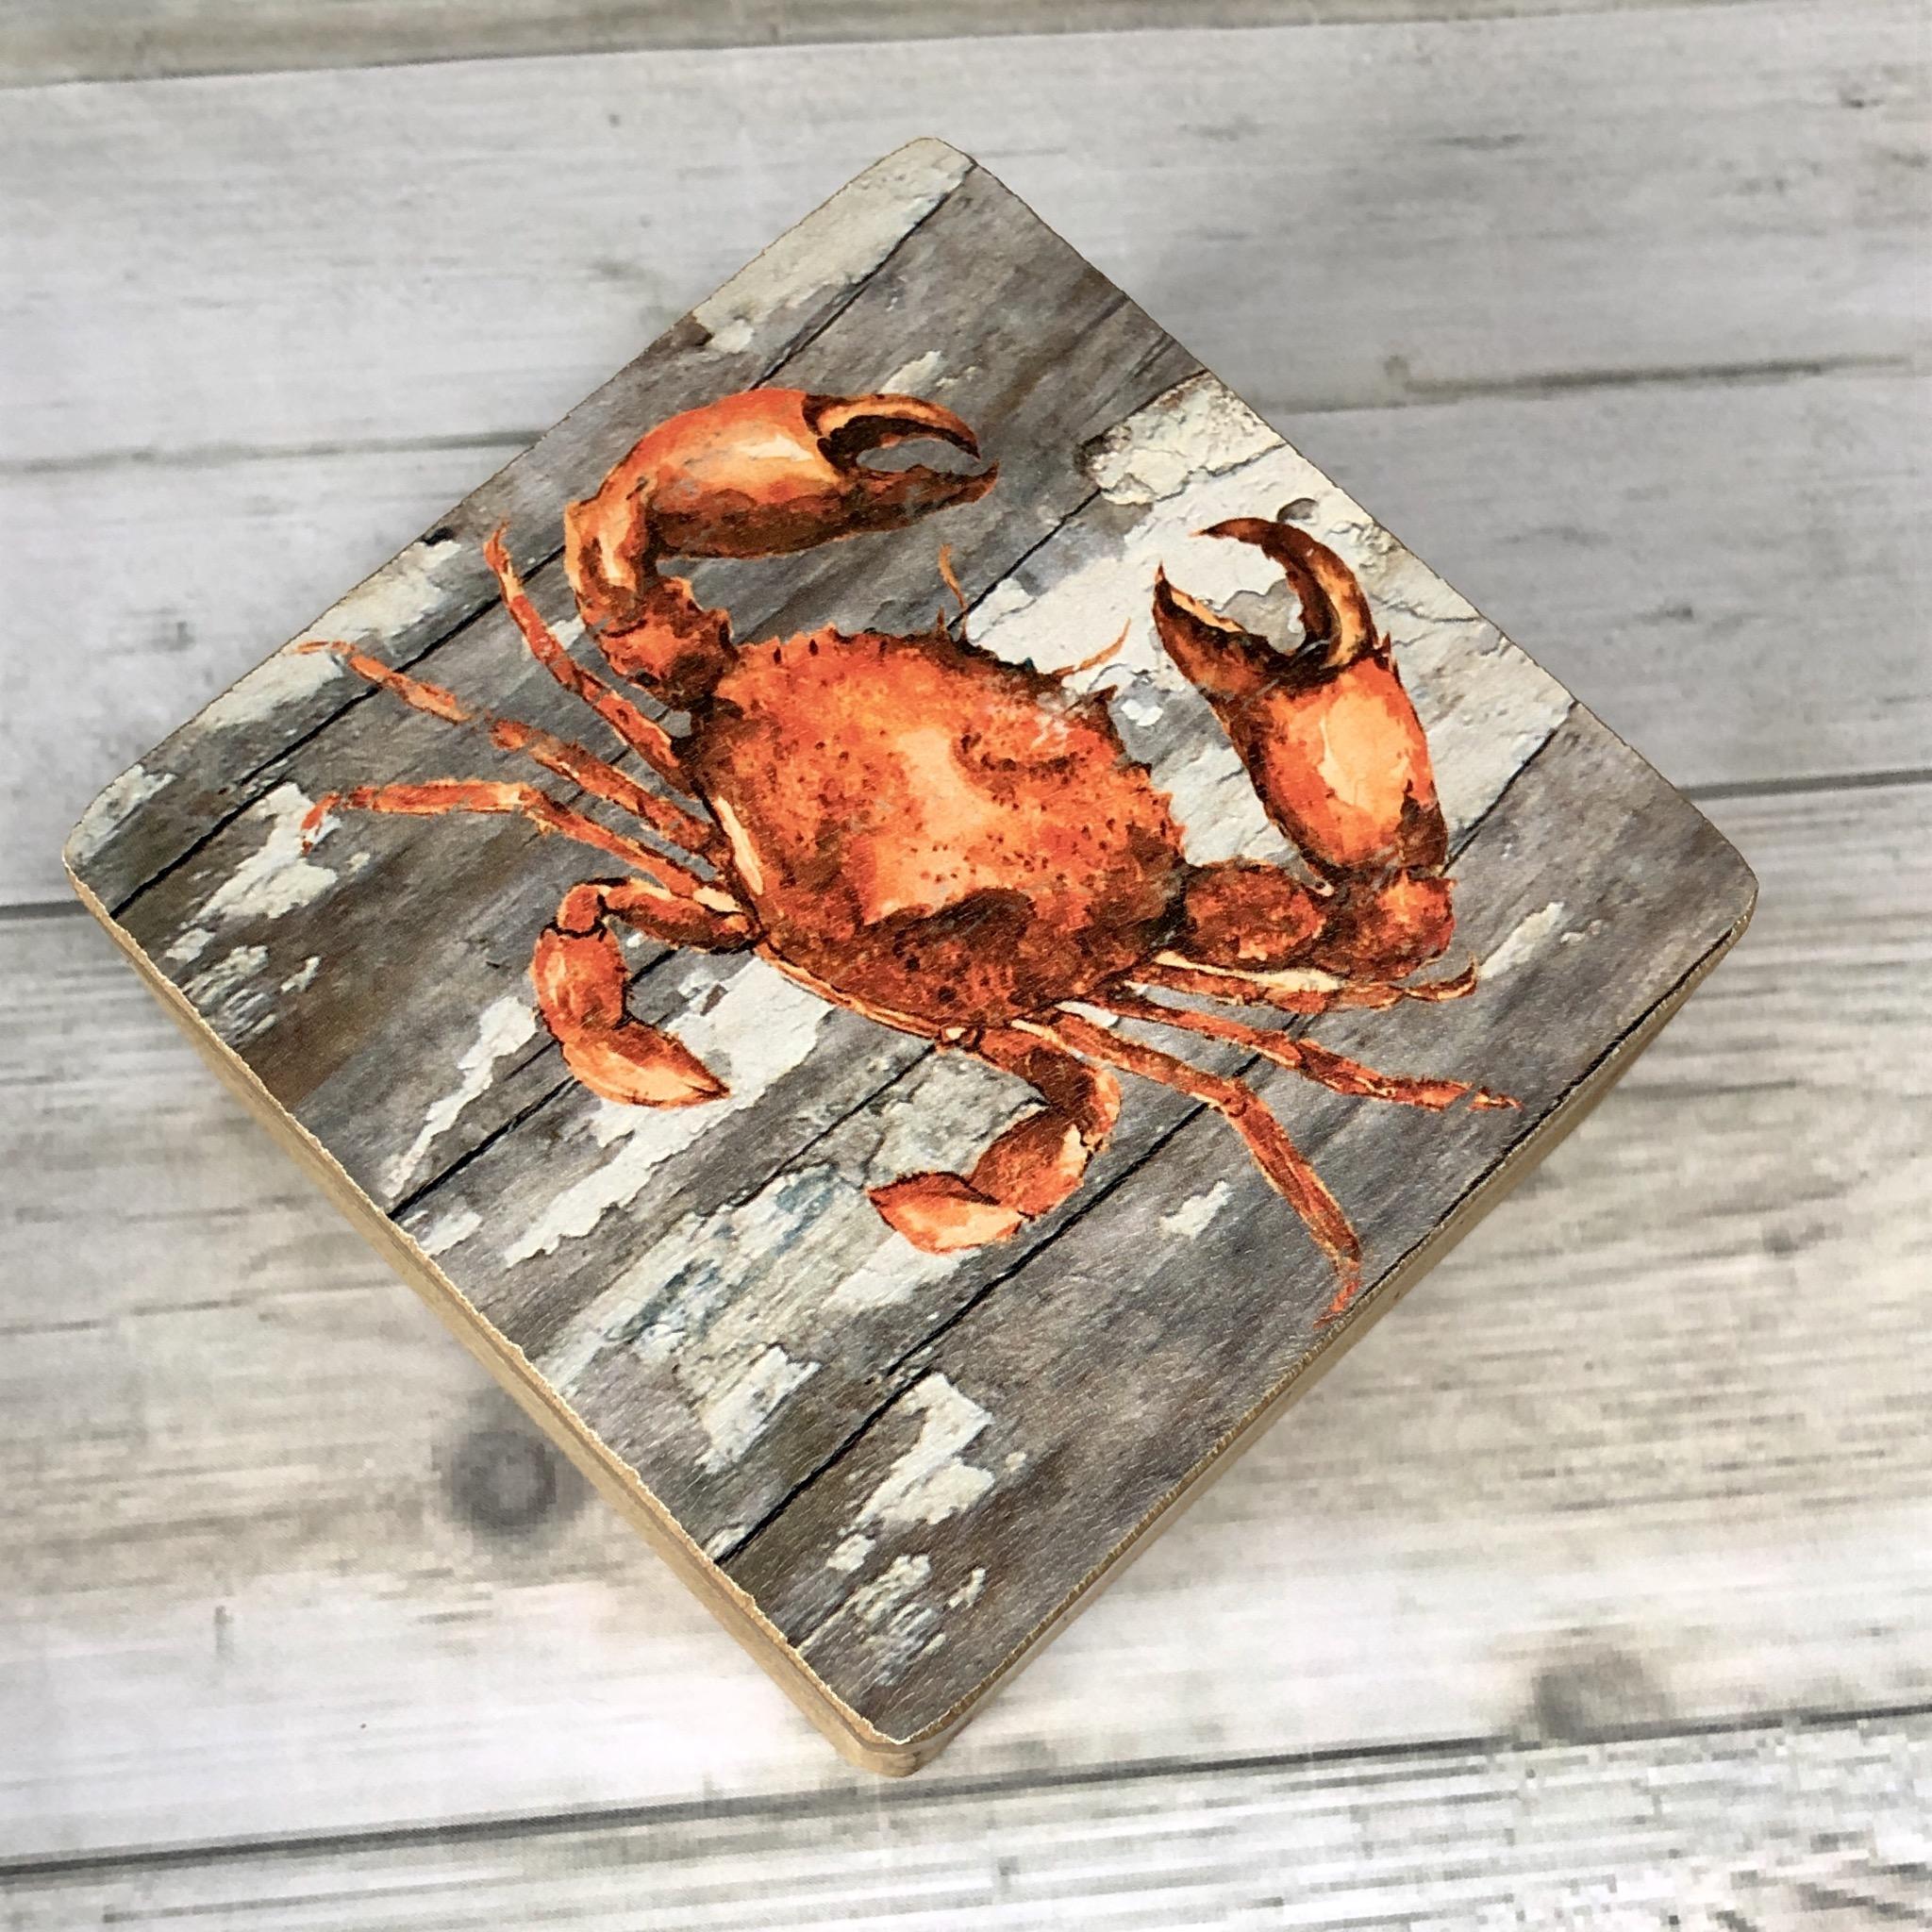 Crab trinket box wooden by shoeless joe